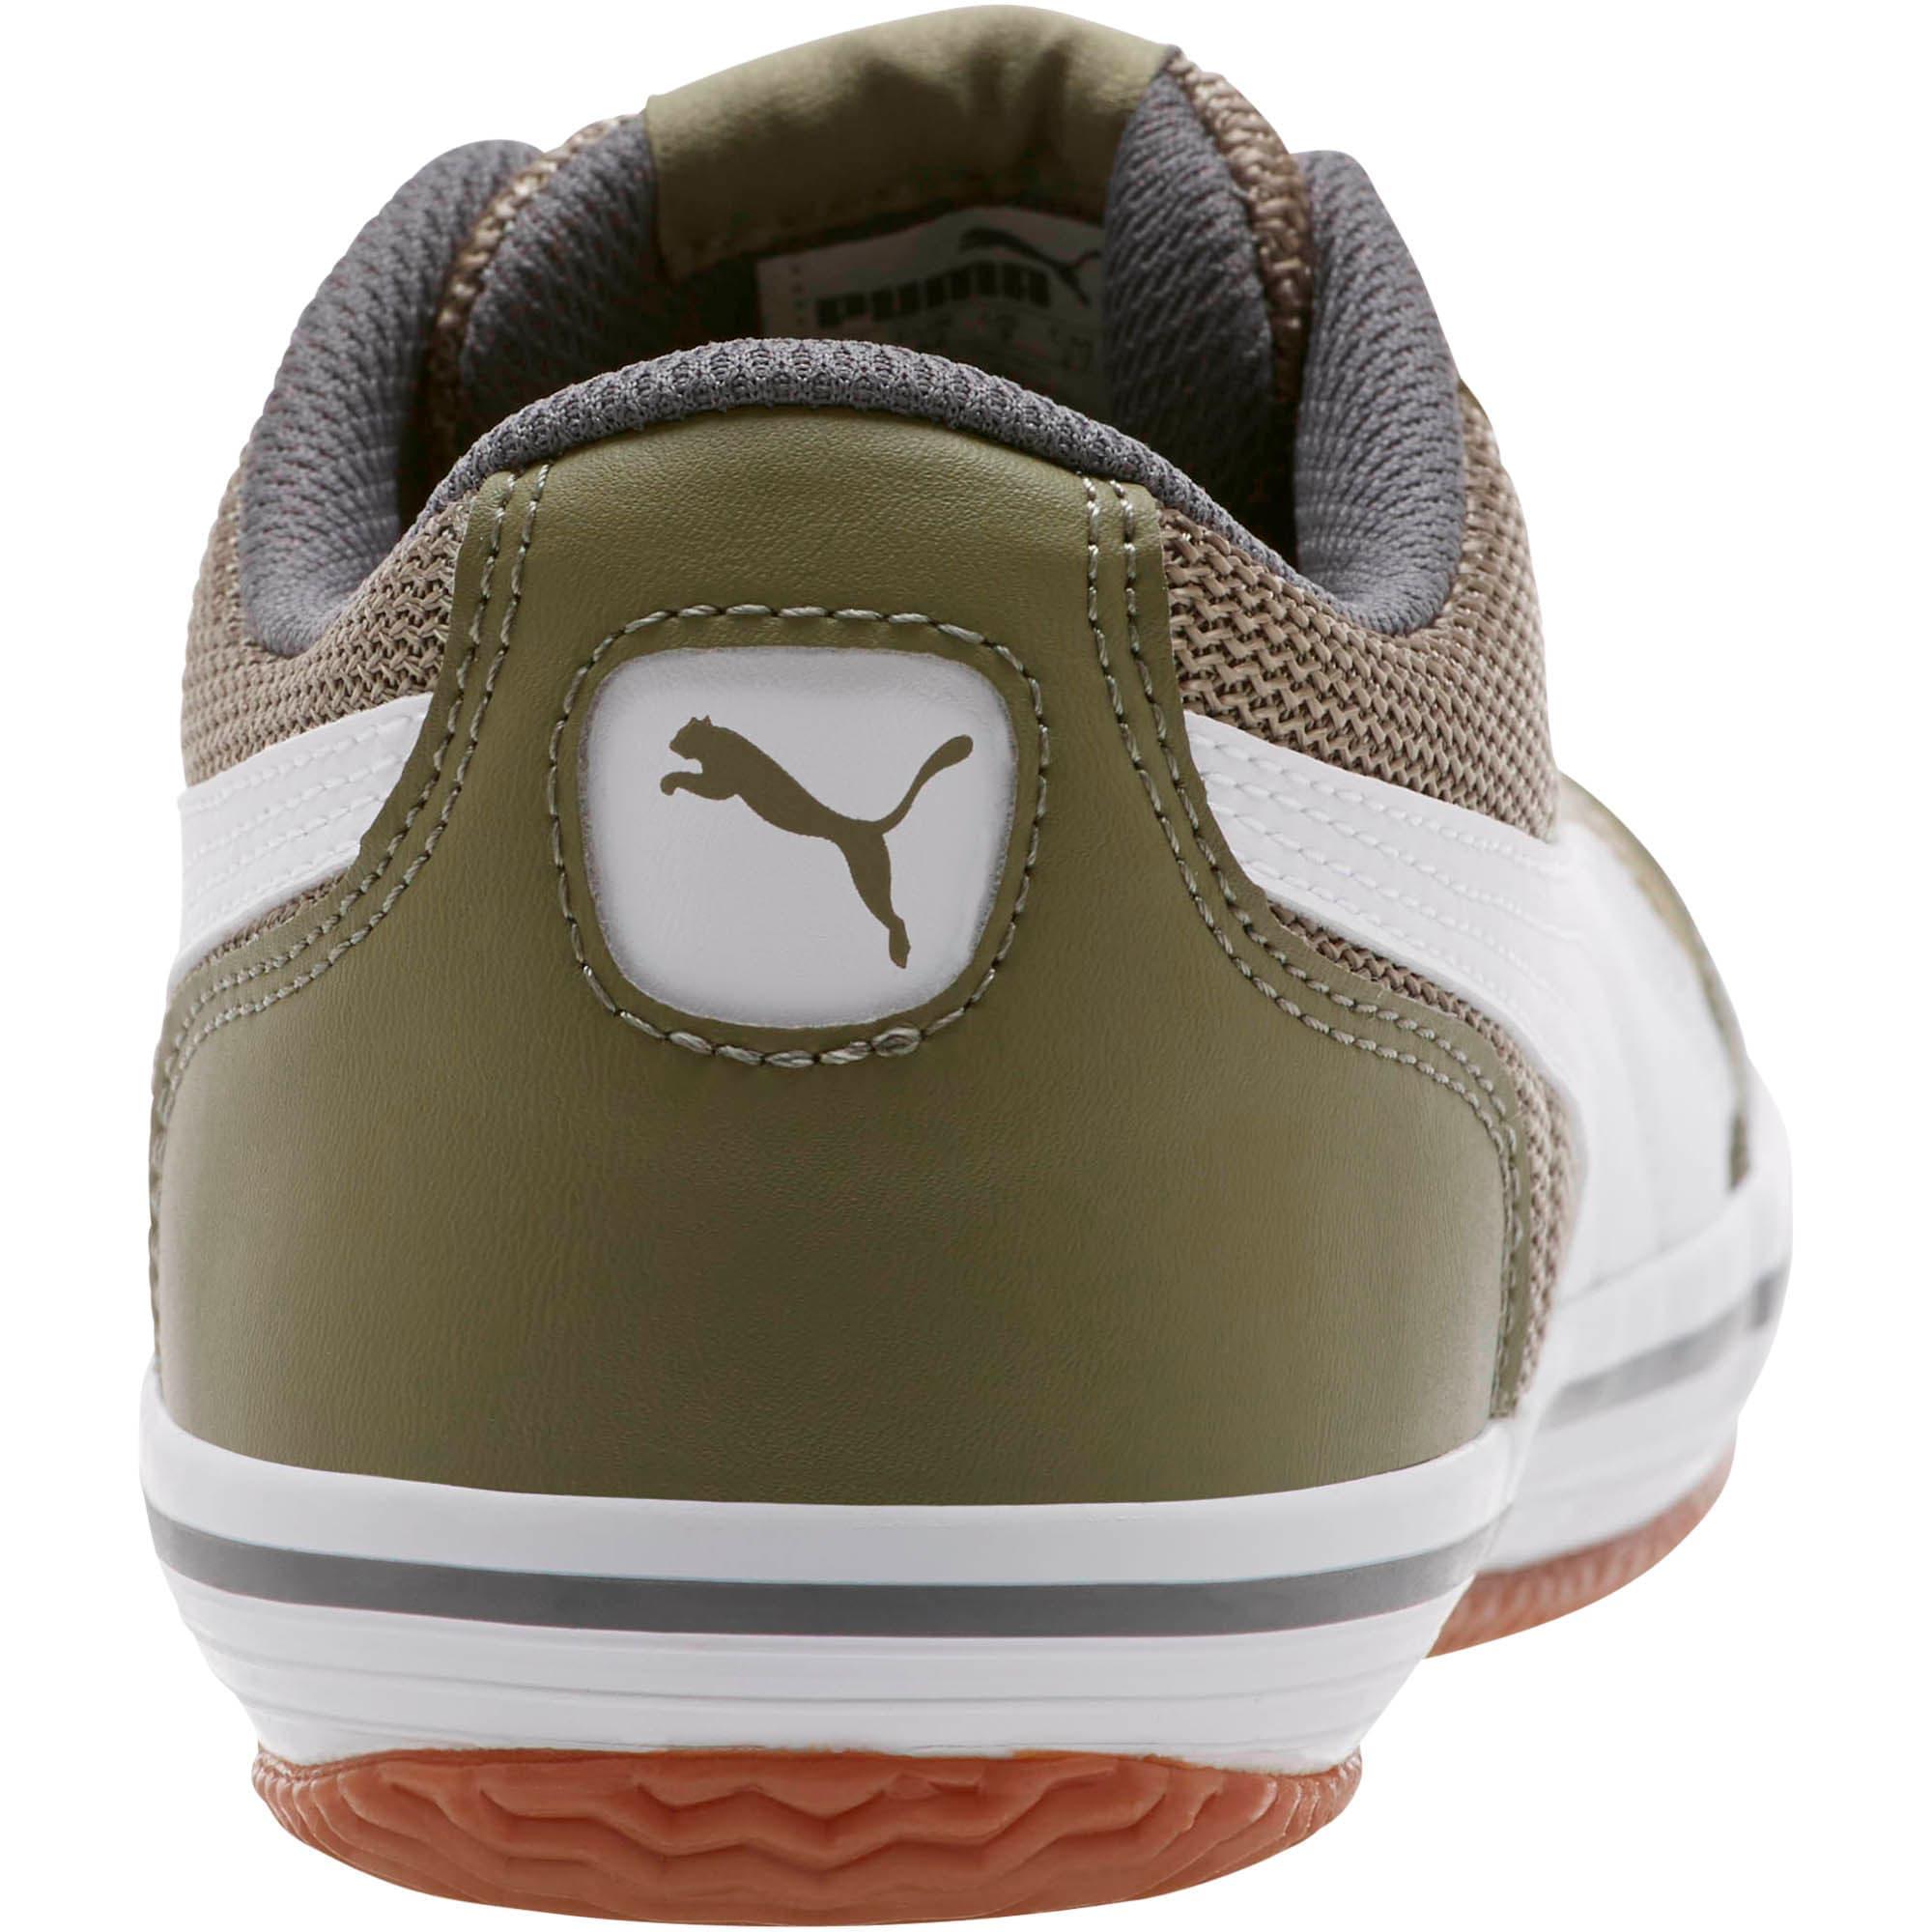 Thumbnail 4 of Astro Sala Sneakers, Burnt Olive-Puma White, medium